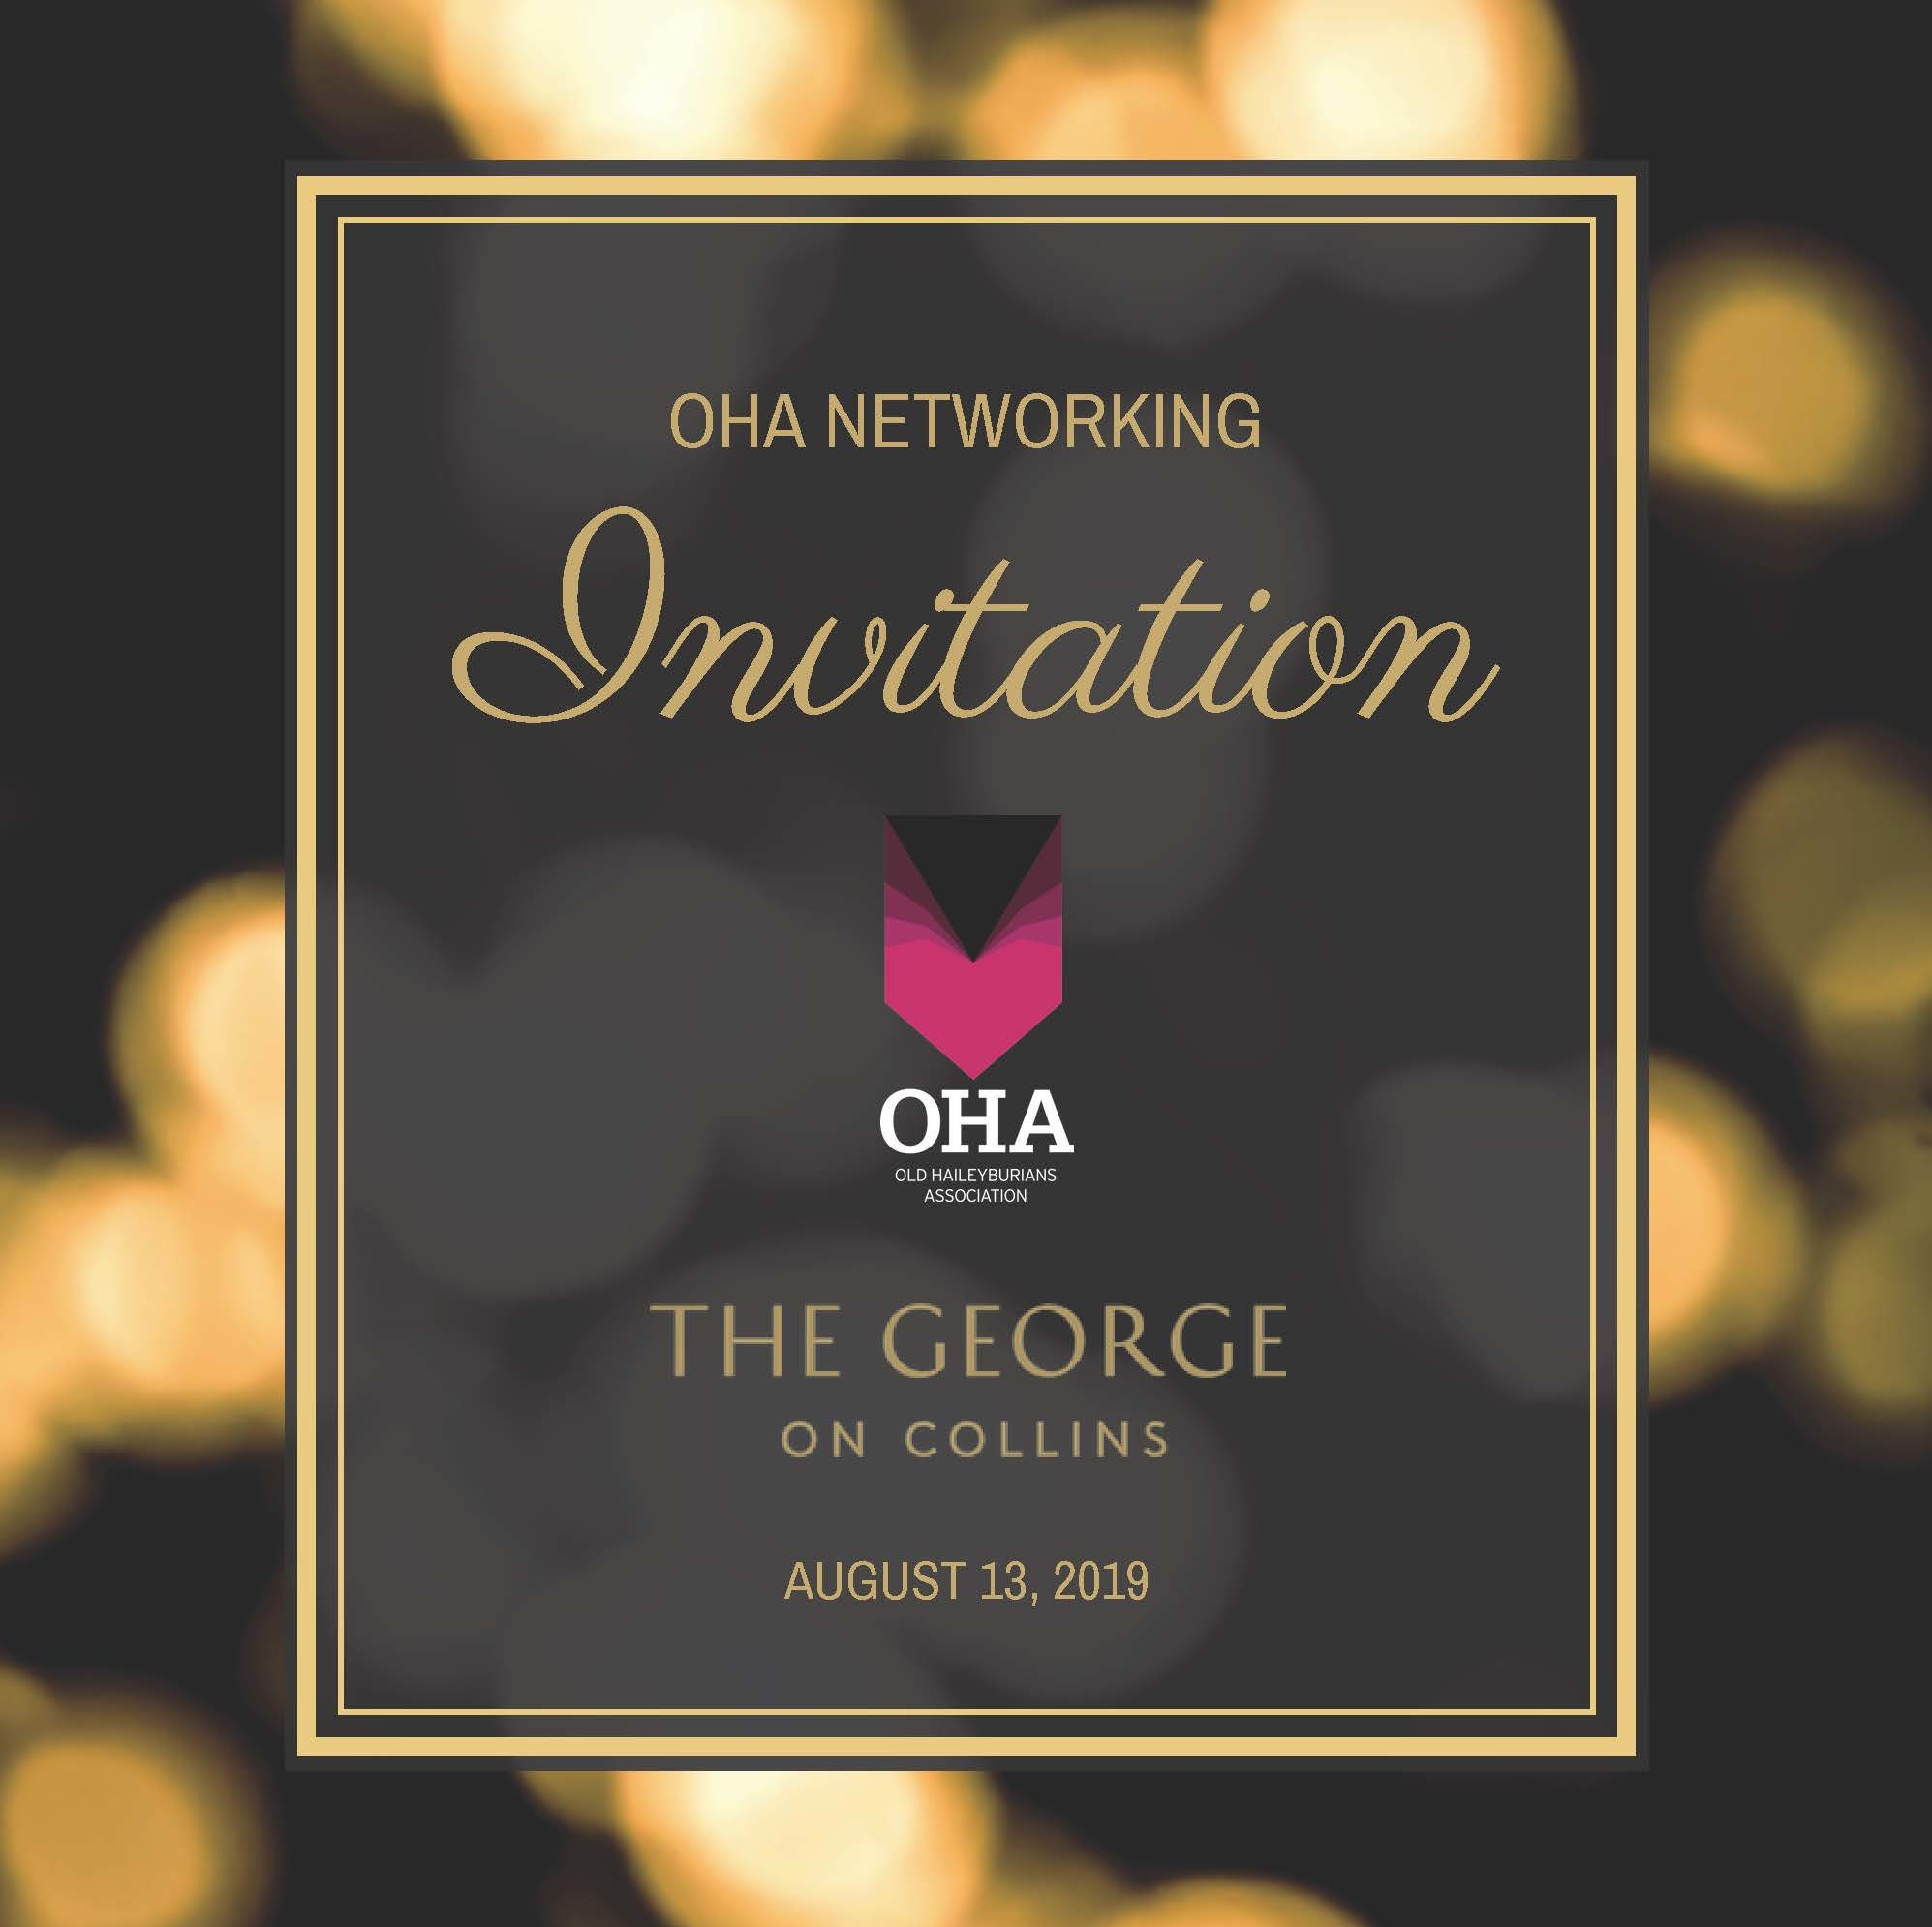 OHA Networking 2019